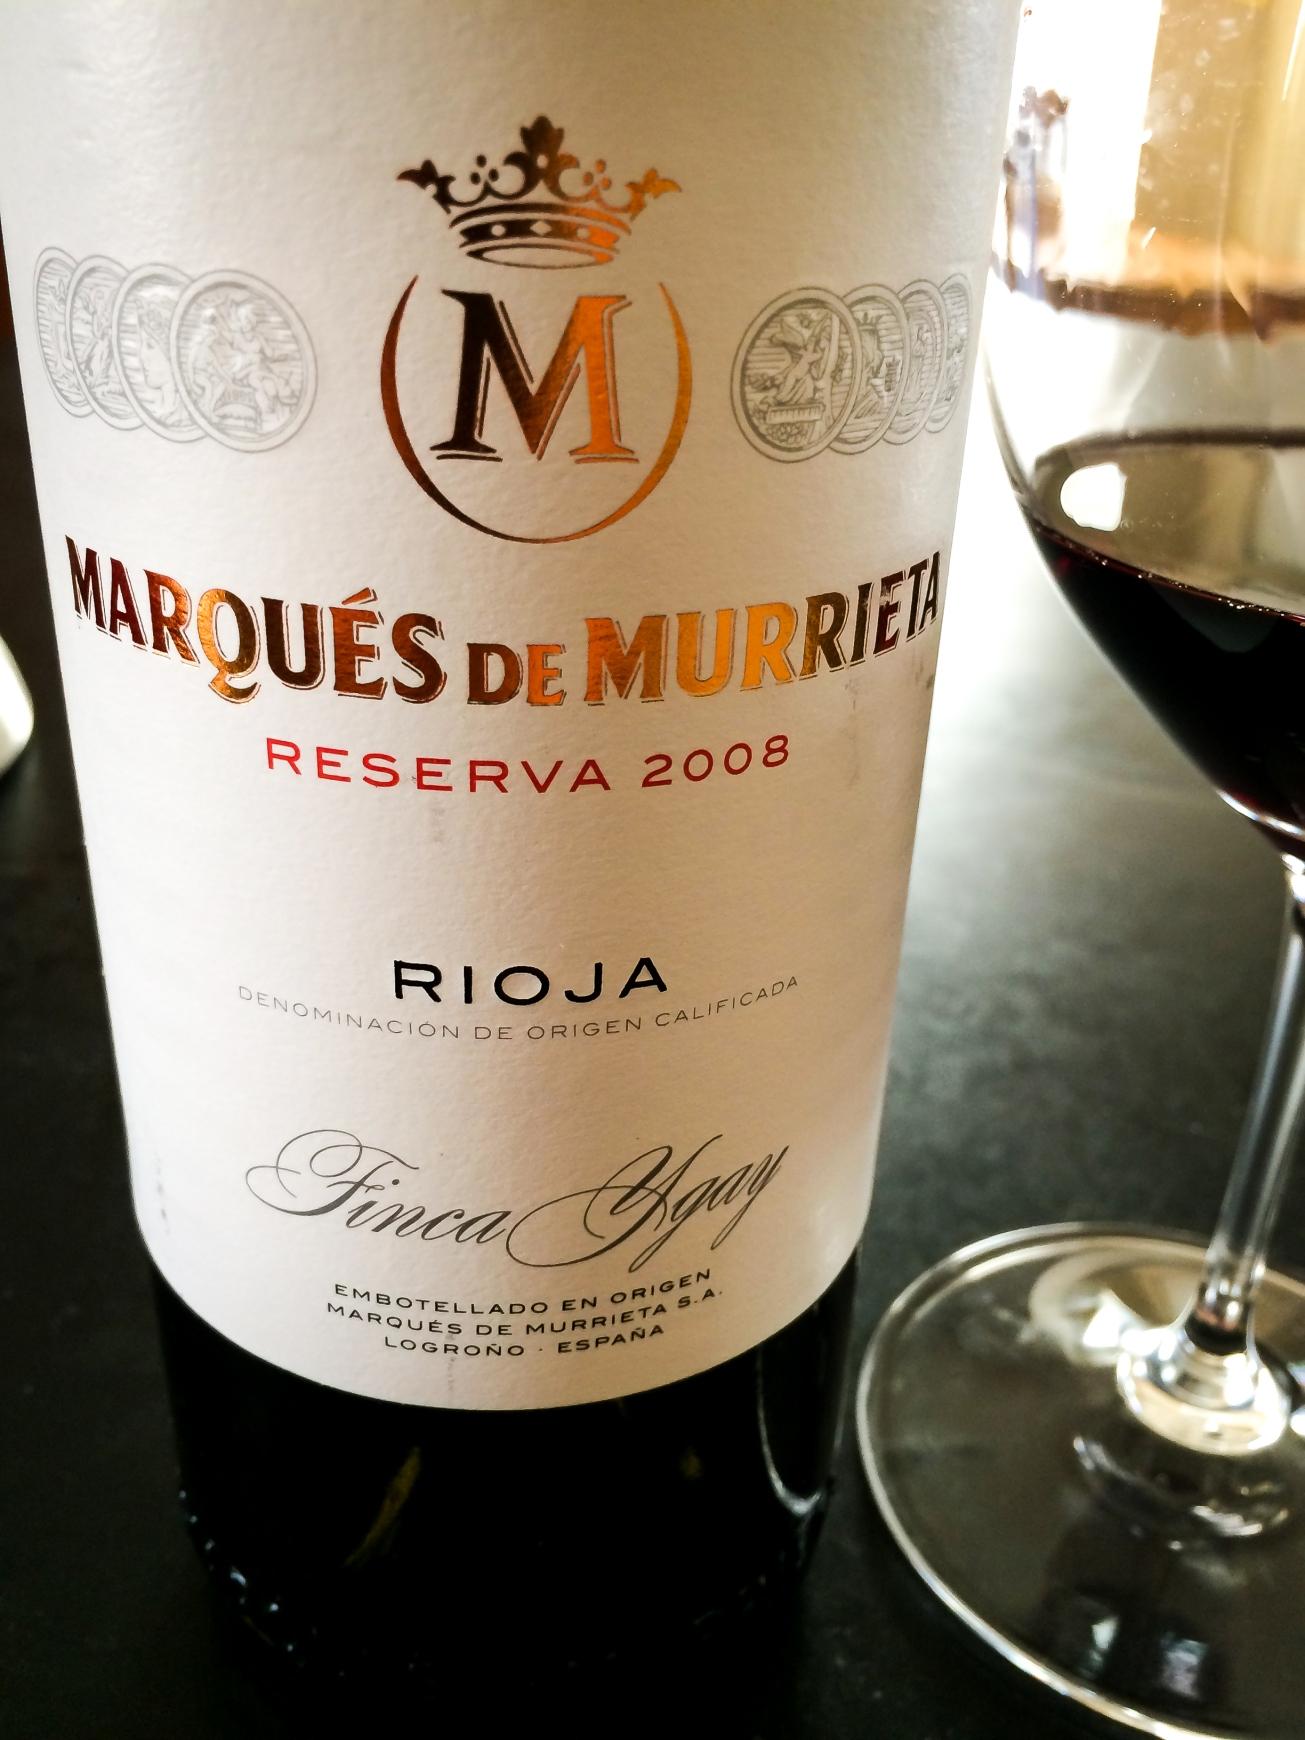 2008 Marqués de Murrieta Rioja Reserva